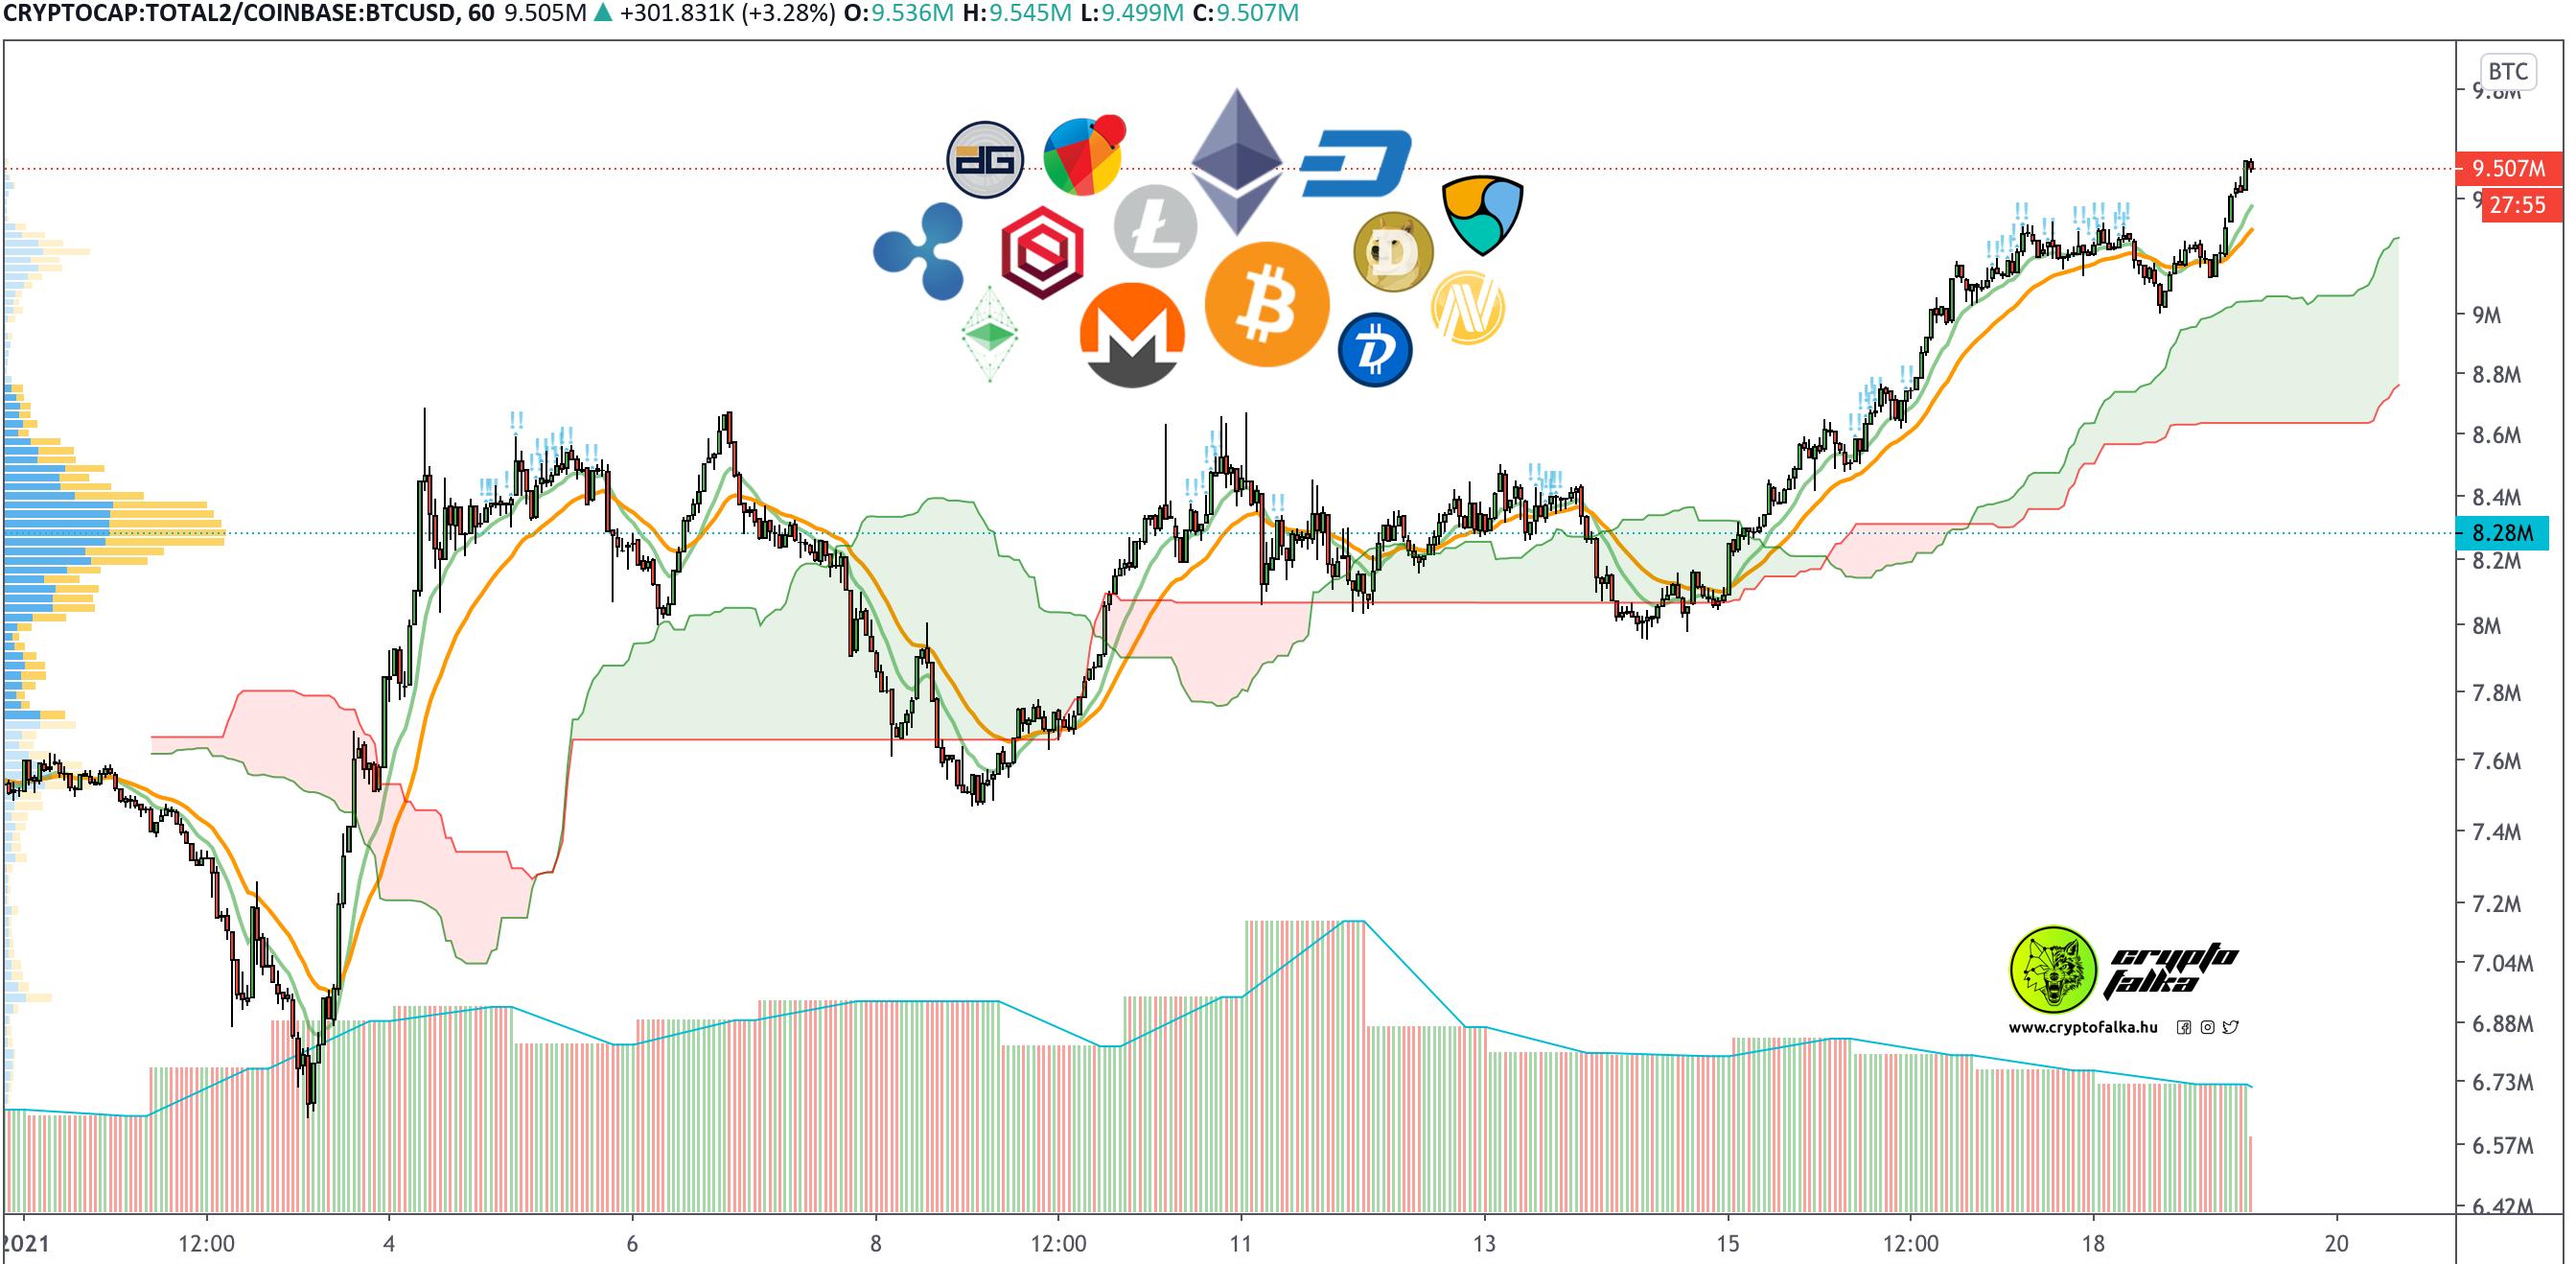 altcoinok piaca a bitcoin ellenében kifejezve I Cryptofalka